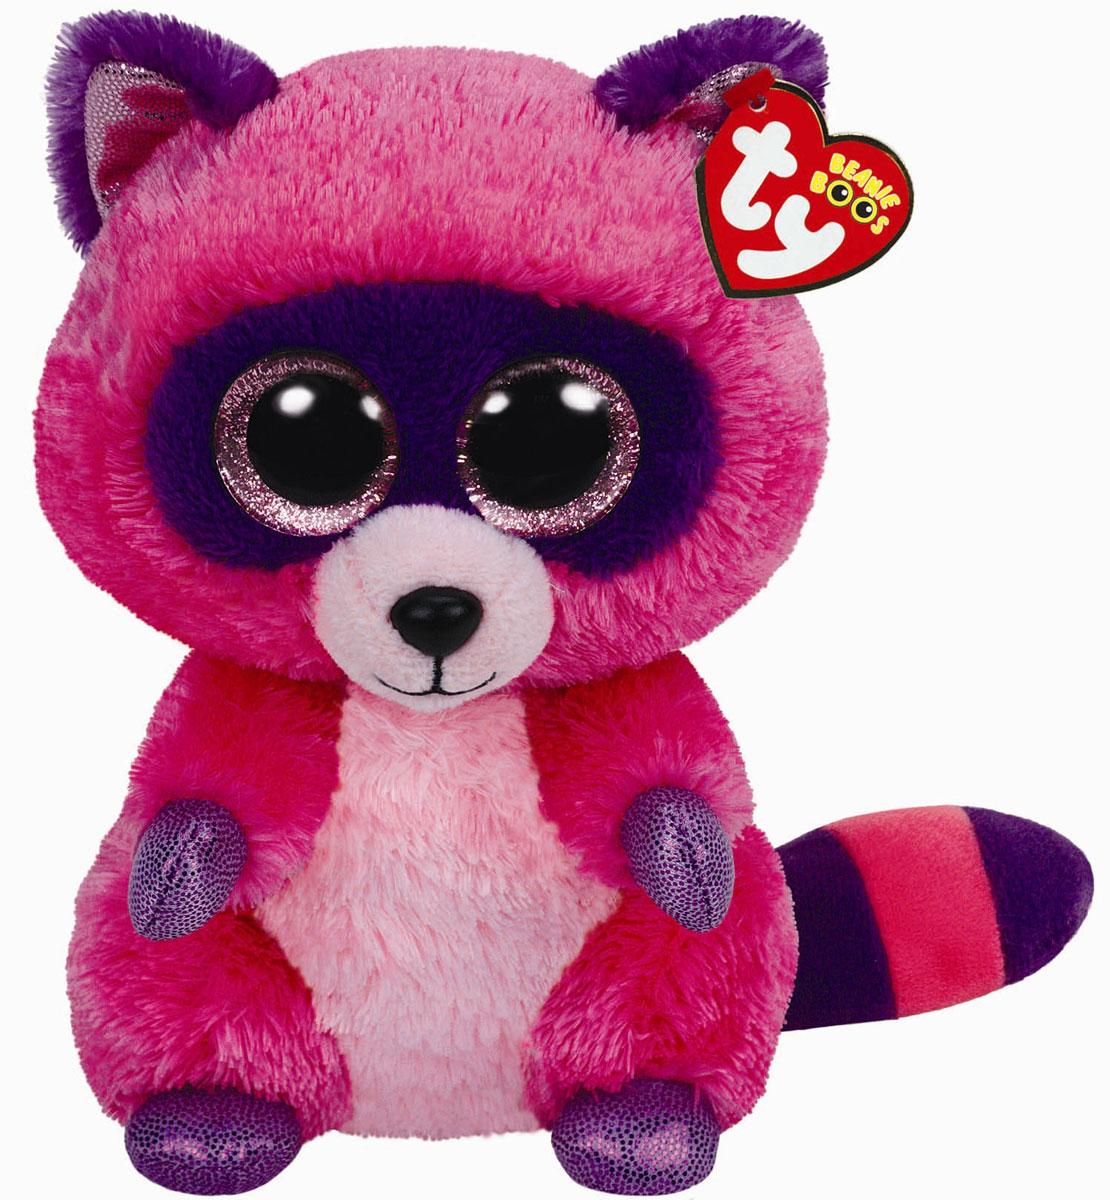 Купить TY Мягкая игрушка Енот Roxie 22 см, TY Inc, Мягкие игрушки